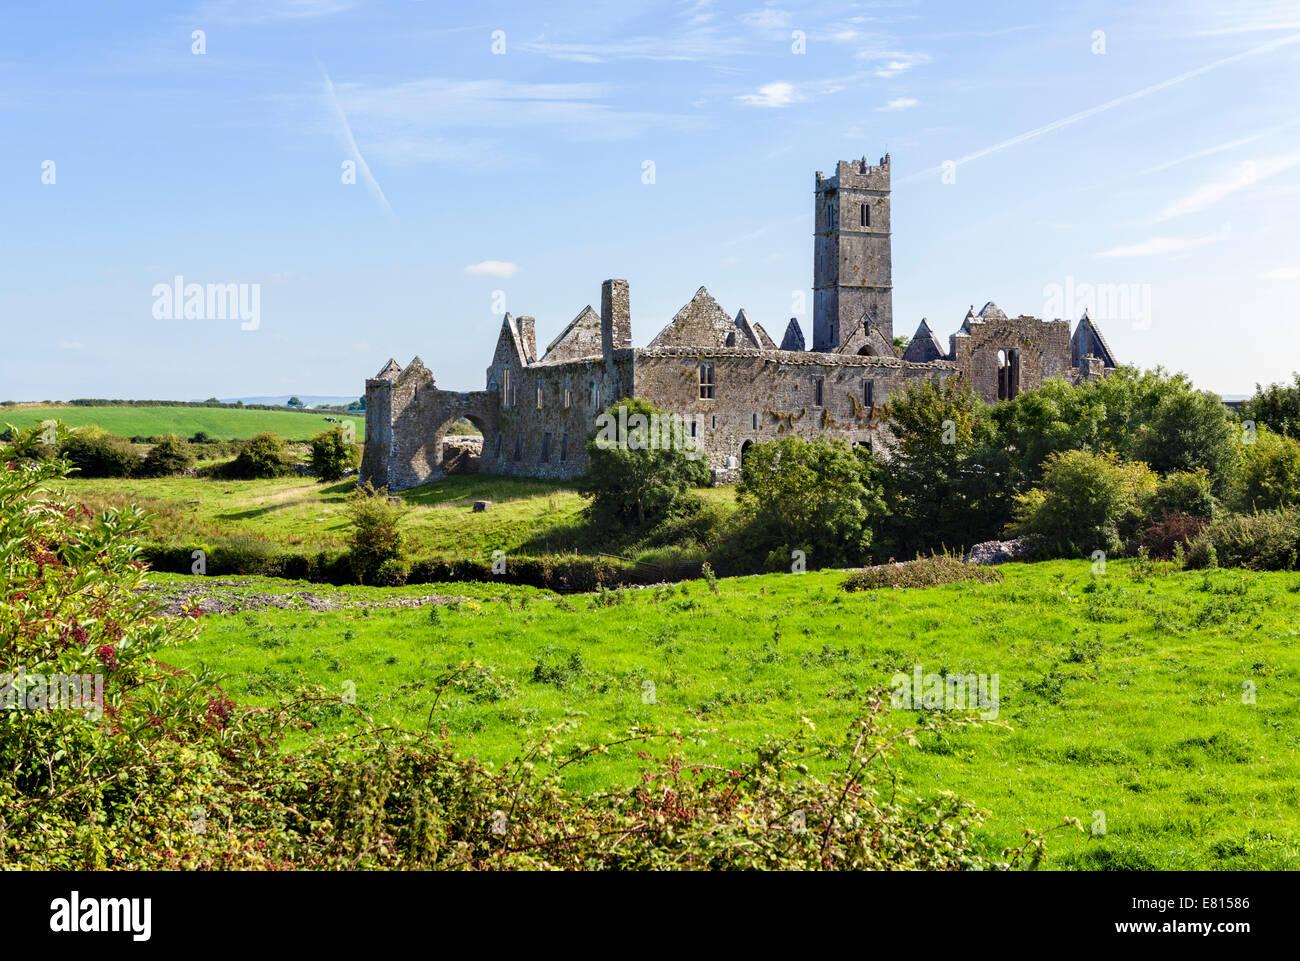 Quin Abbey, near Ennis, County Clare, Republic of Ireland - Stock Image